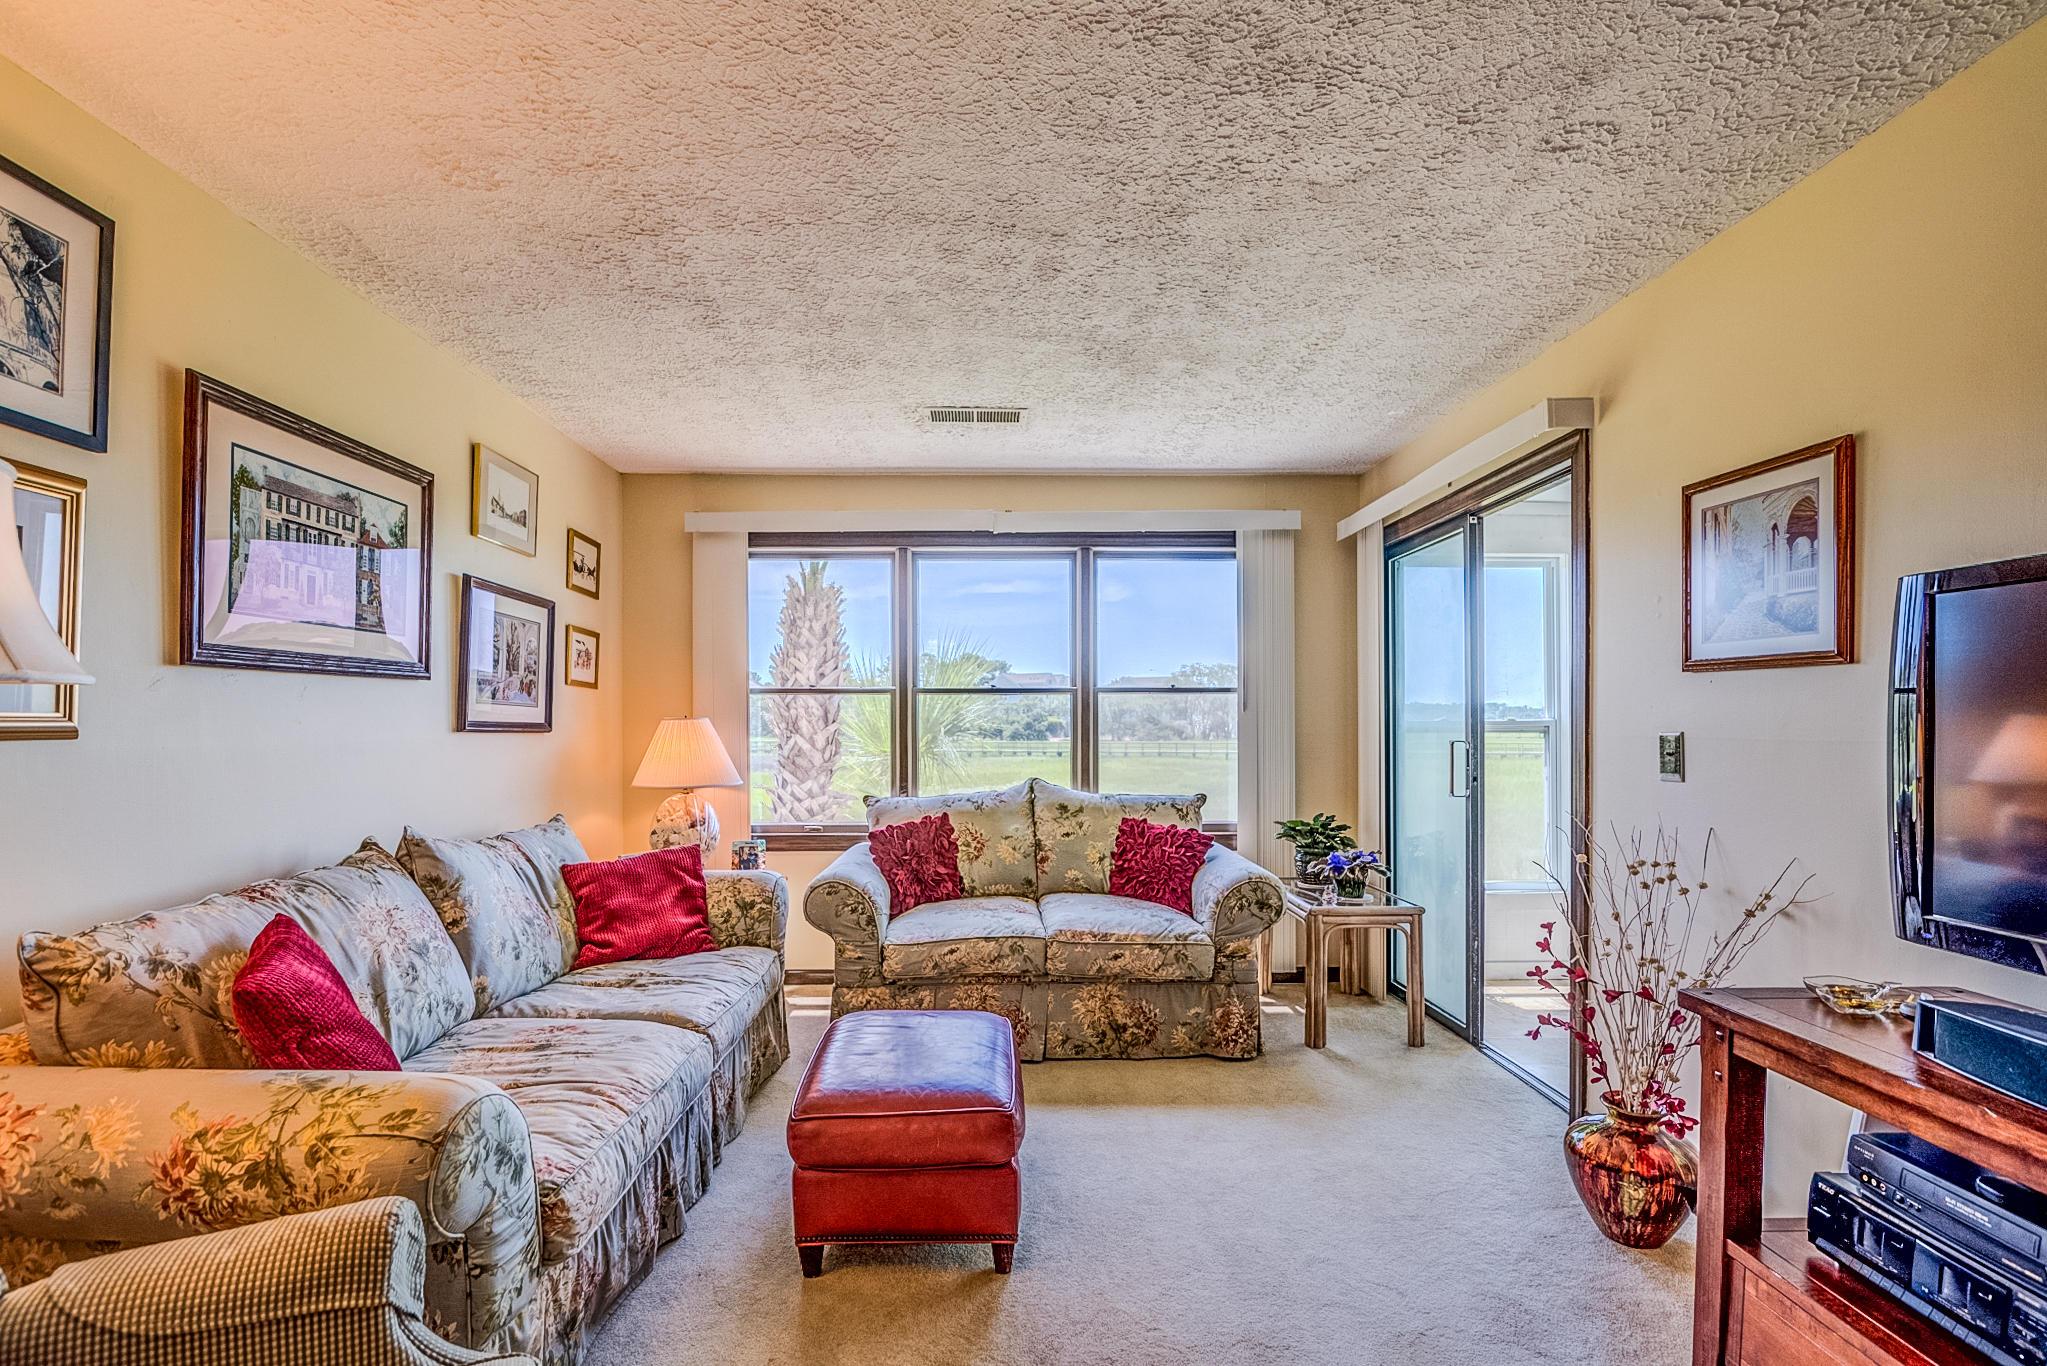 Bay Pointe Villas Homes For Sale - 2127 Landfall, Johns Island, SC - 7